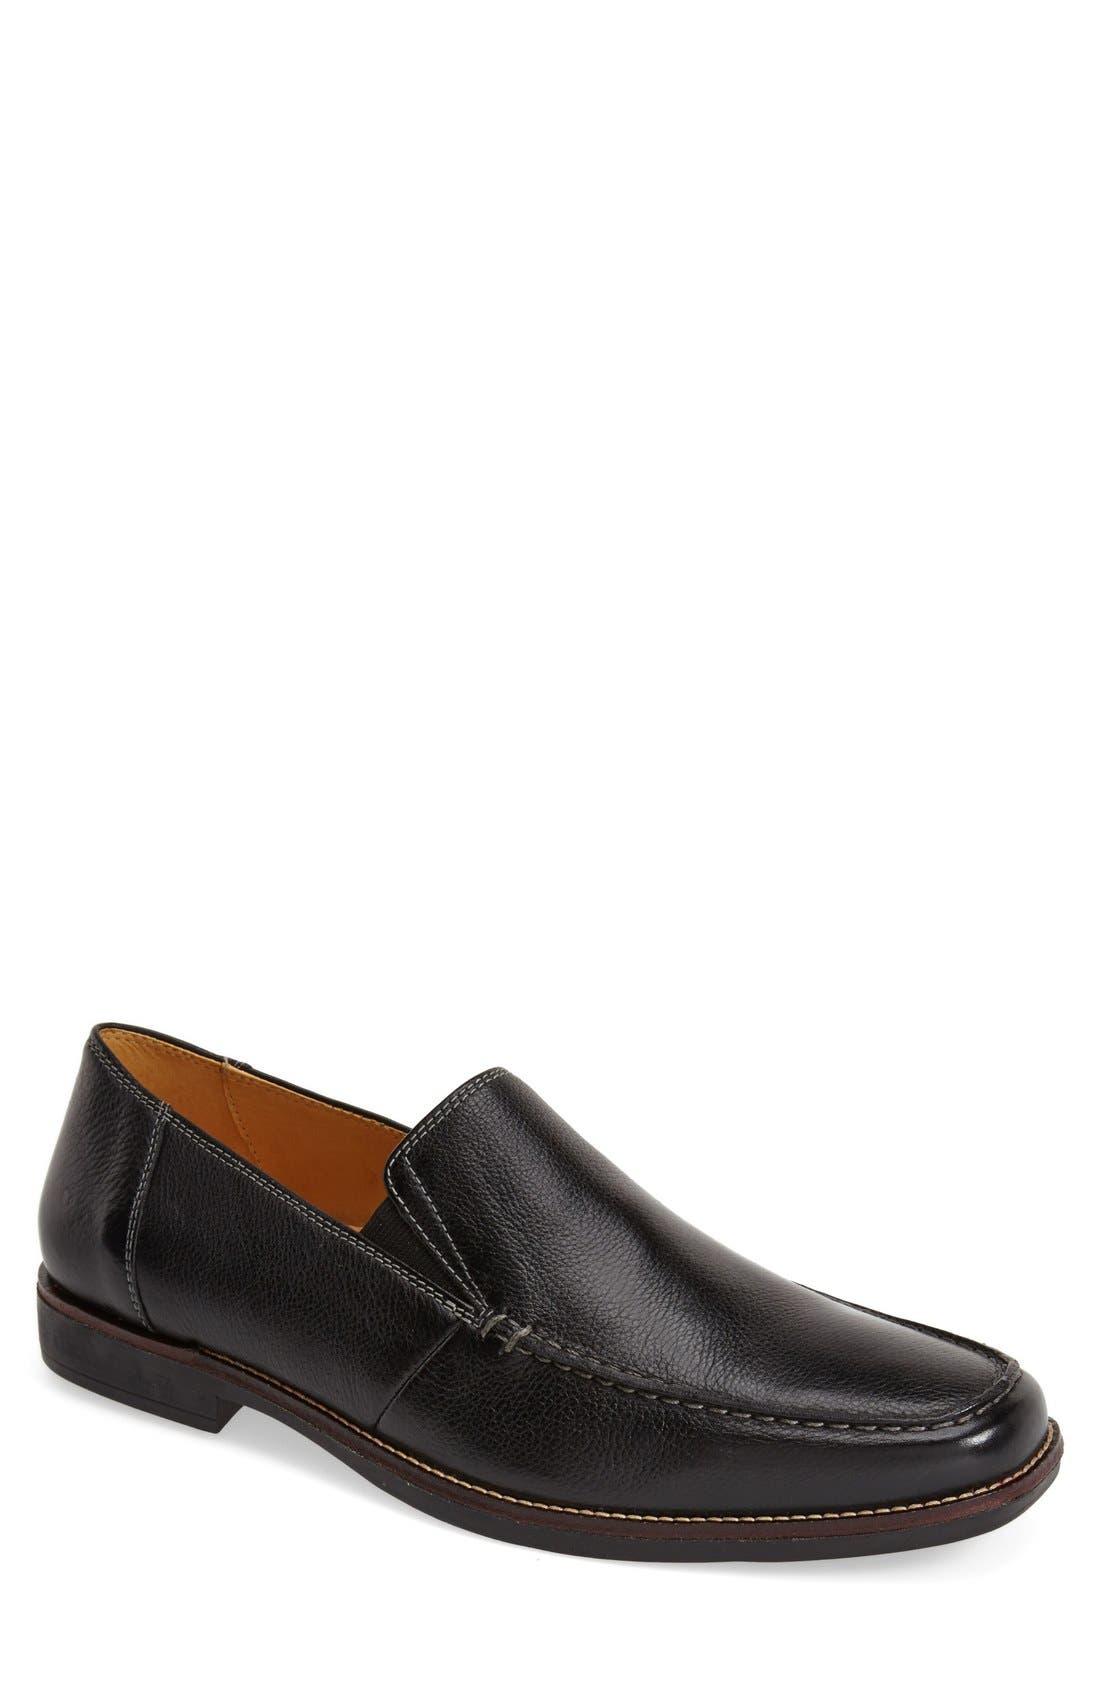 'Easy' Leather Venetian Loafer,                             Main thumbnail 1, color,                             Black